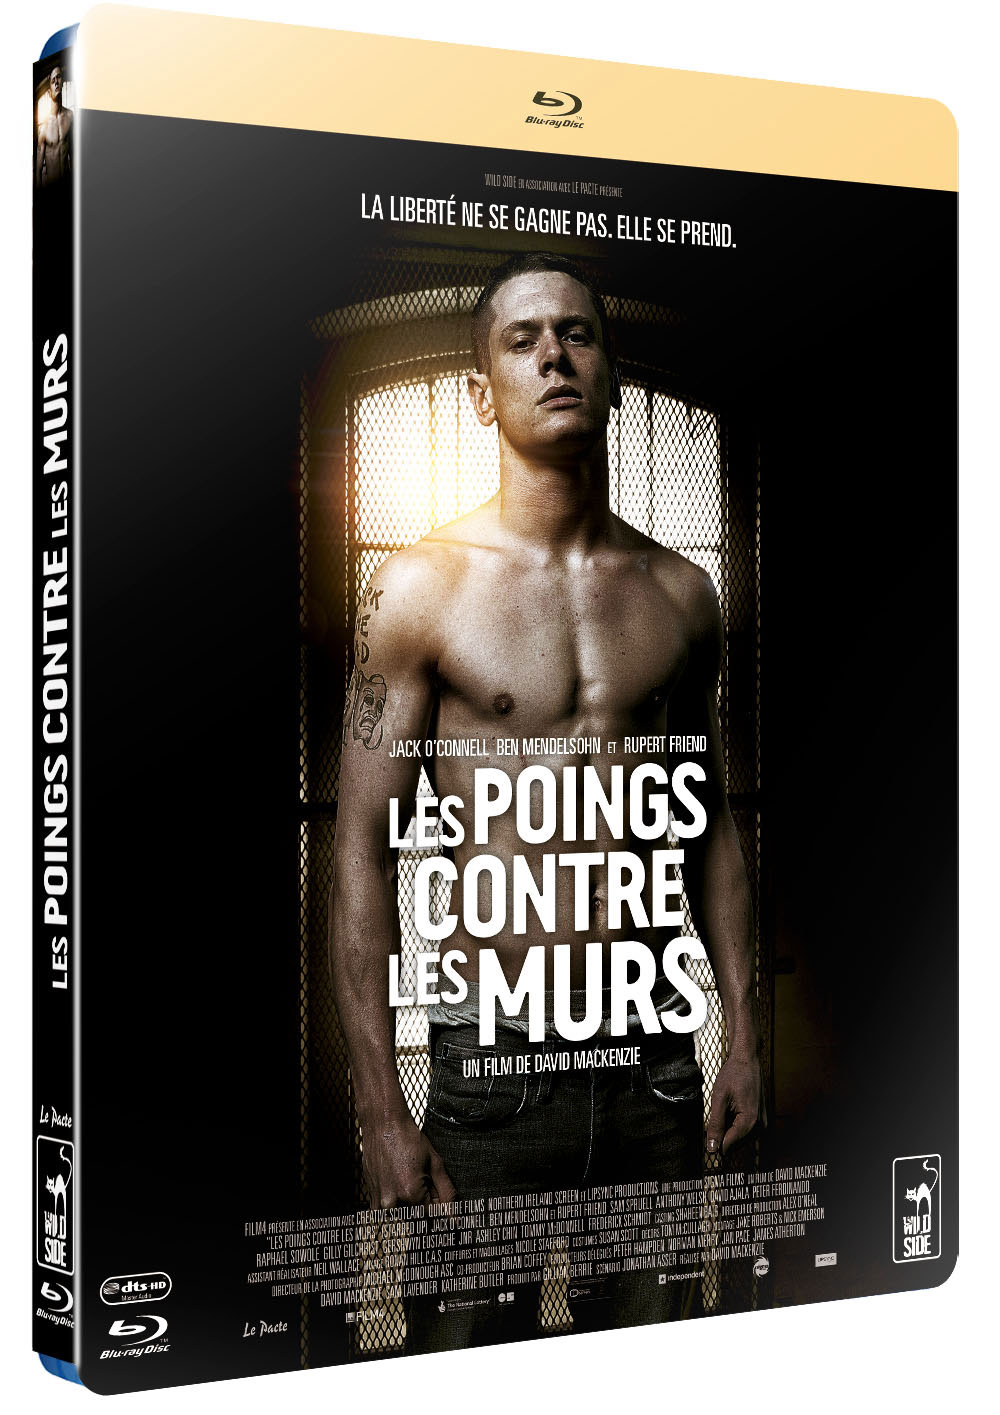 Pack-3D-Blu-Ray-LES-POINGS-CONTRE-LES-MURS